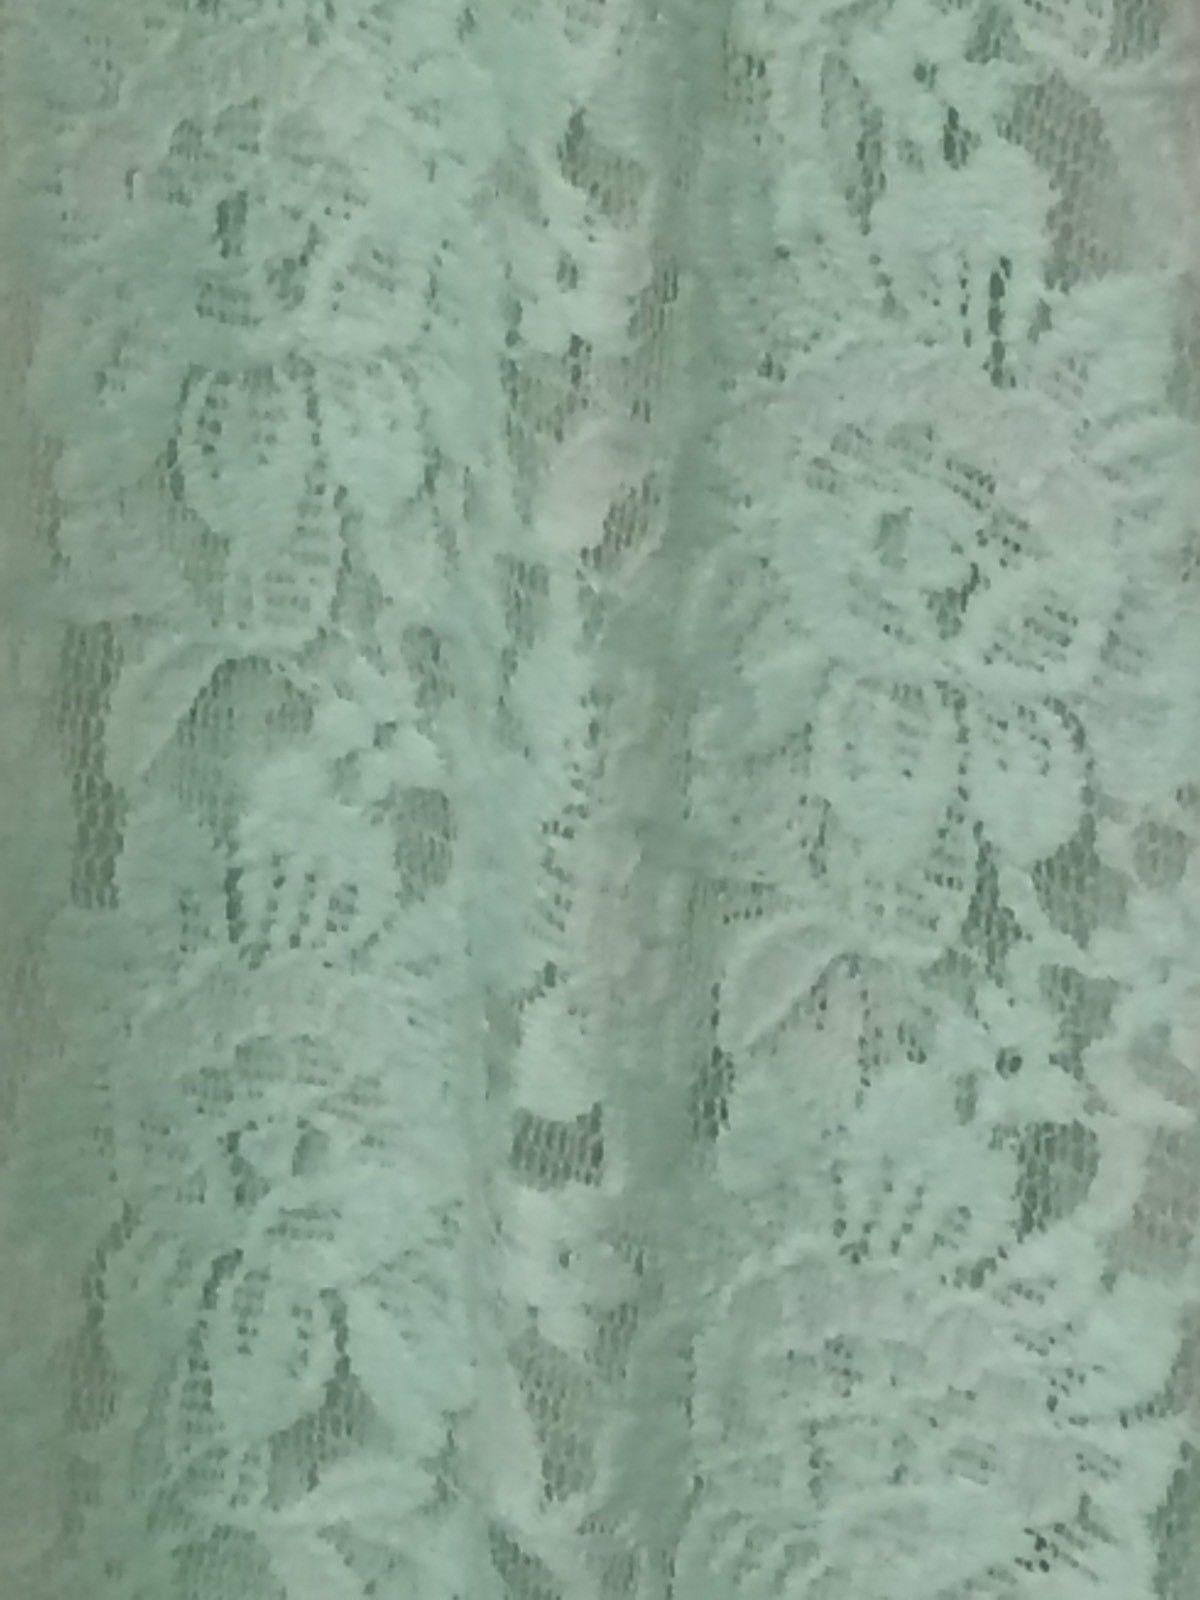 X-SMALL LuLaRoe JOY LACE VEST SOFT PALE MINT GREEN cardigan layering NWT XS